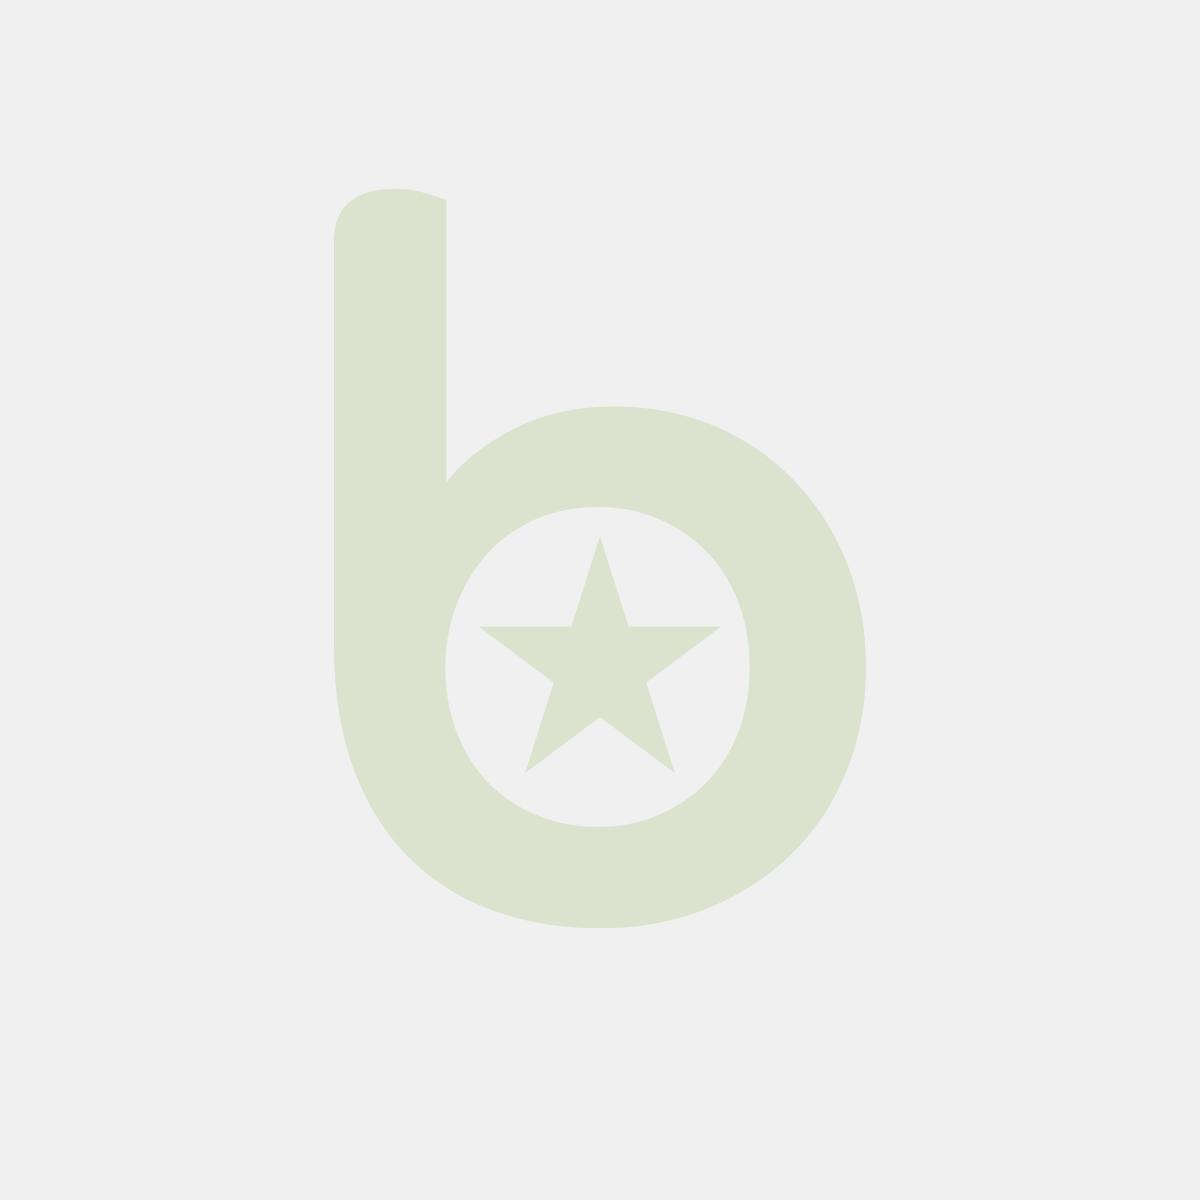 Ręcznik rola MAXI EcoNatural 3800 LUCART 200m, 3W op. 2 rolki